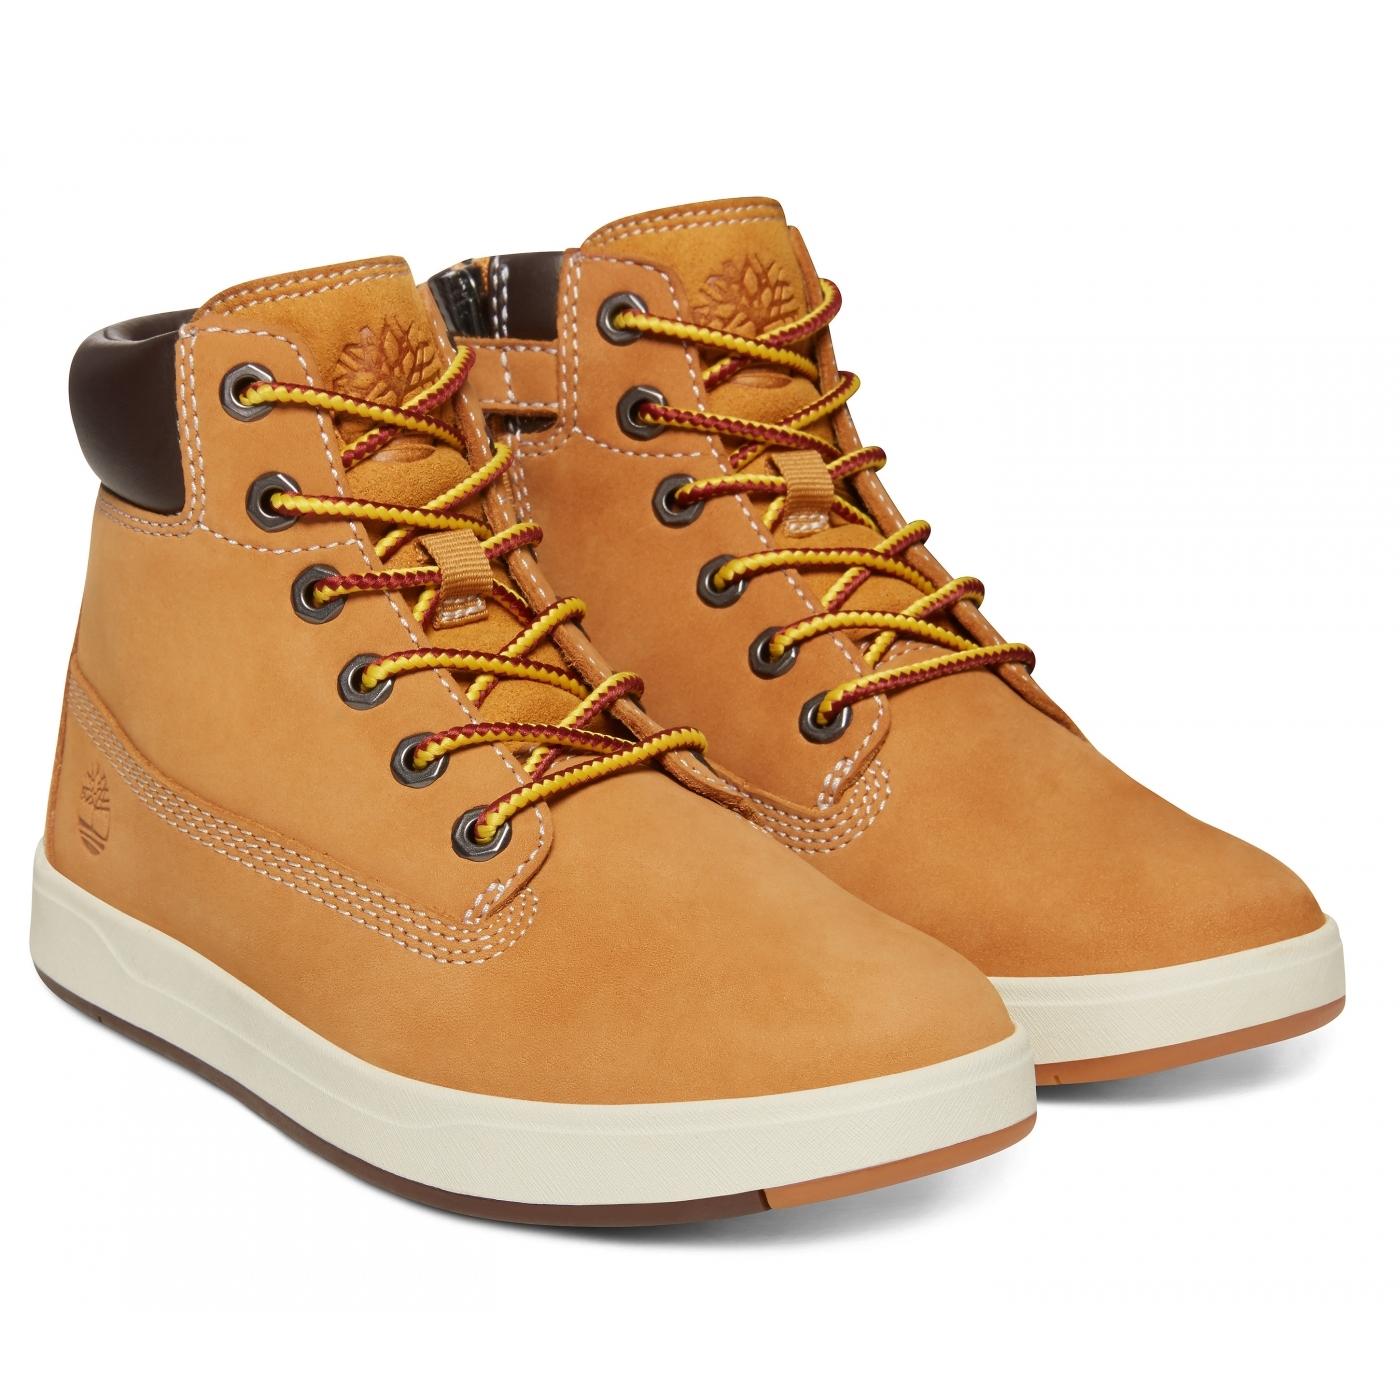 2b9234756c0d6 Chaussures Timberland Davis Square 6-inch Wheat | Alltricks.com